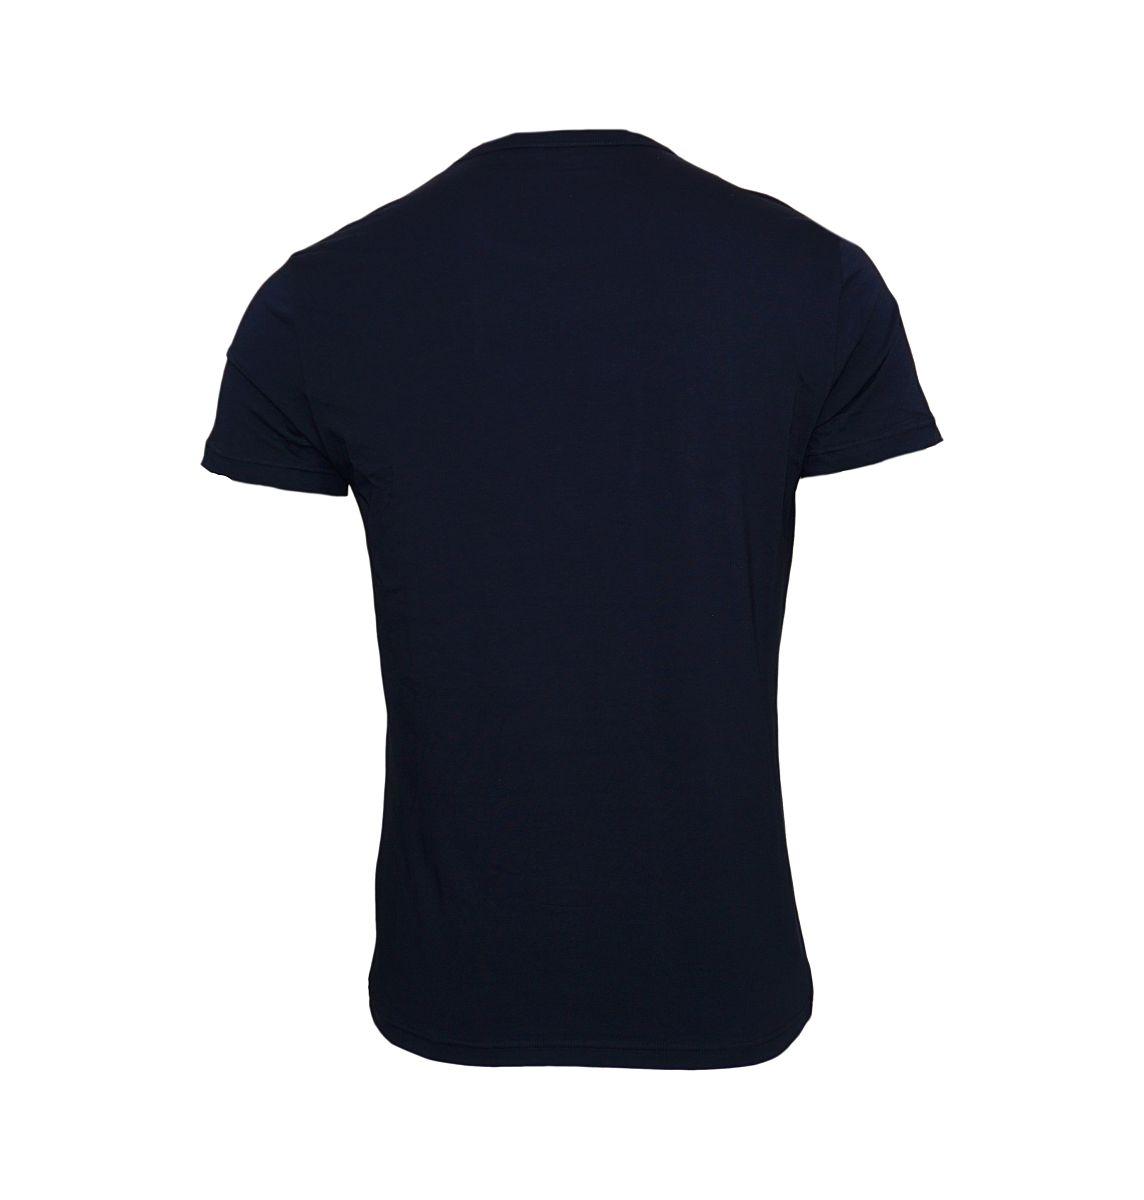 Emporio Armani 2er Pack T-Shirts Rundhals 111267 8P717 27435 MARINE/MARINE W18-EATS1